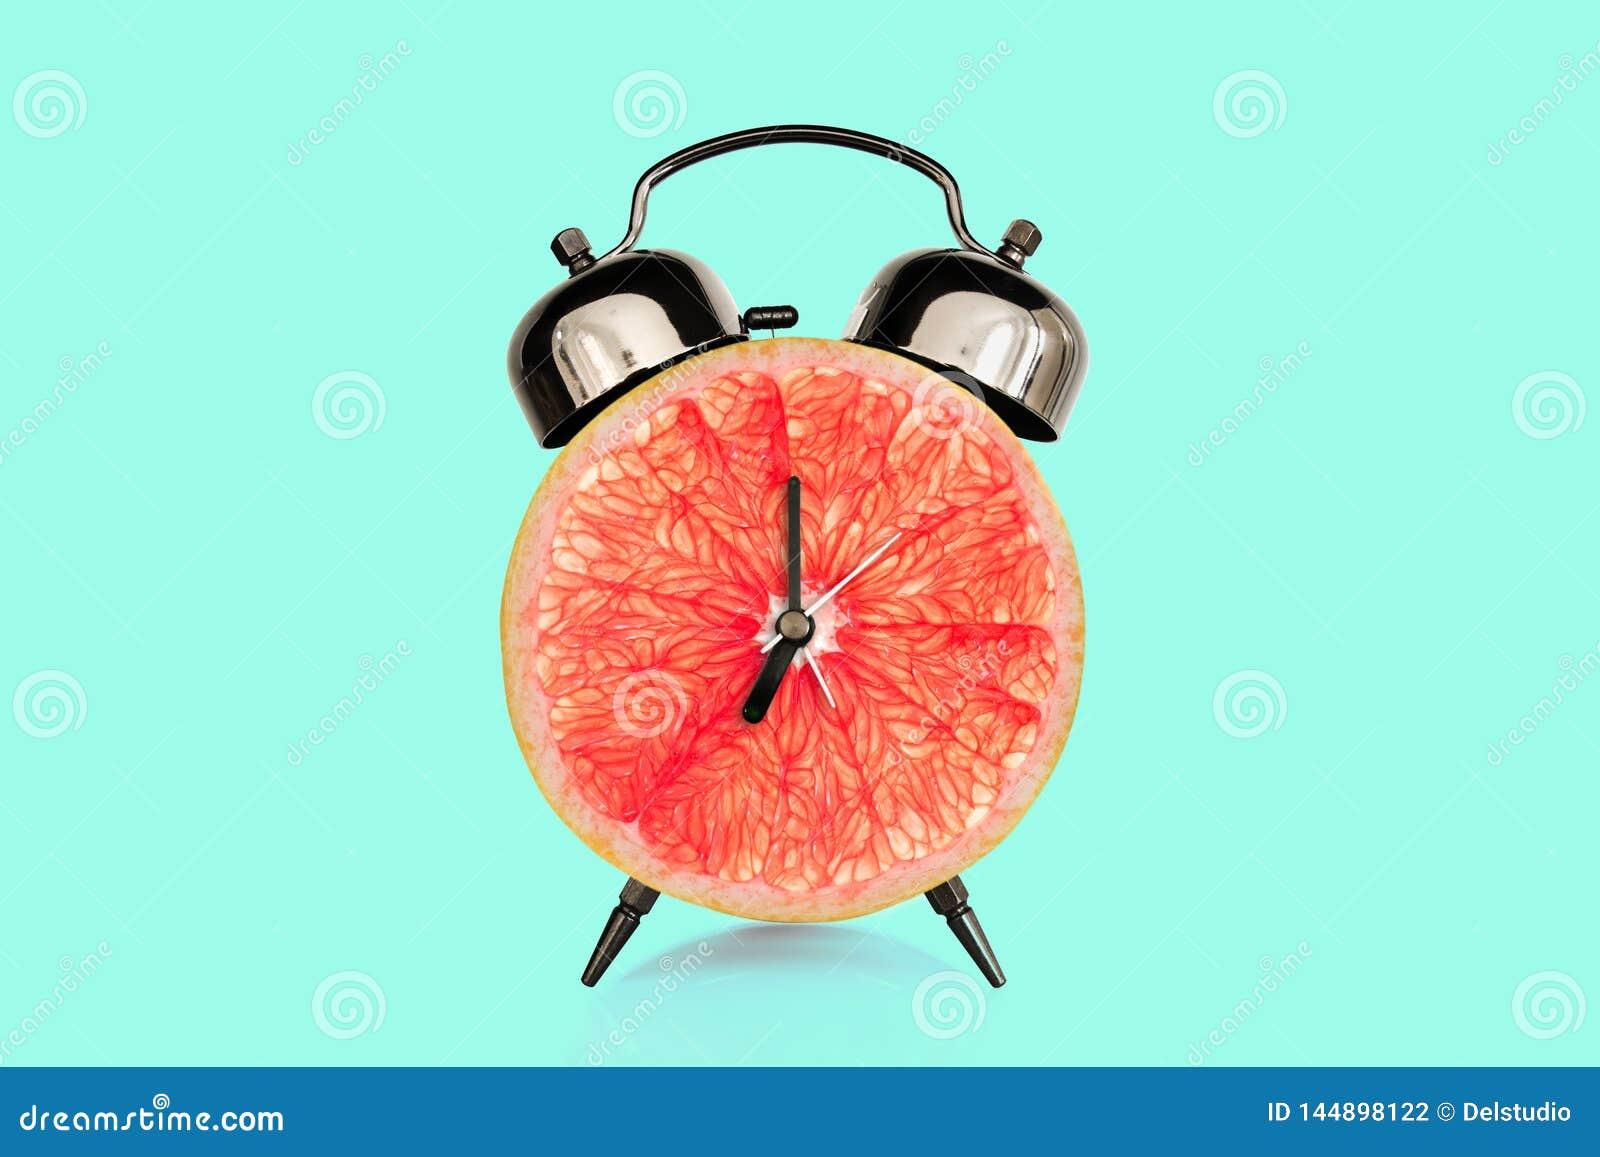 Grapefruit Slice On Alarm Clock, Blue Pastel Background ...